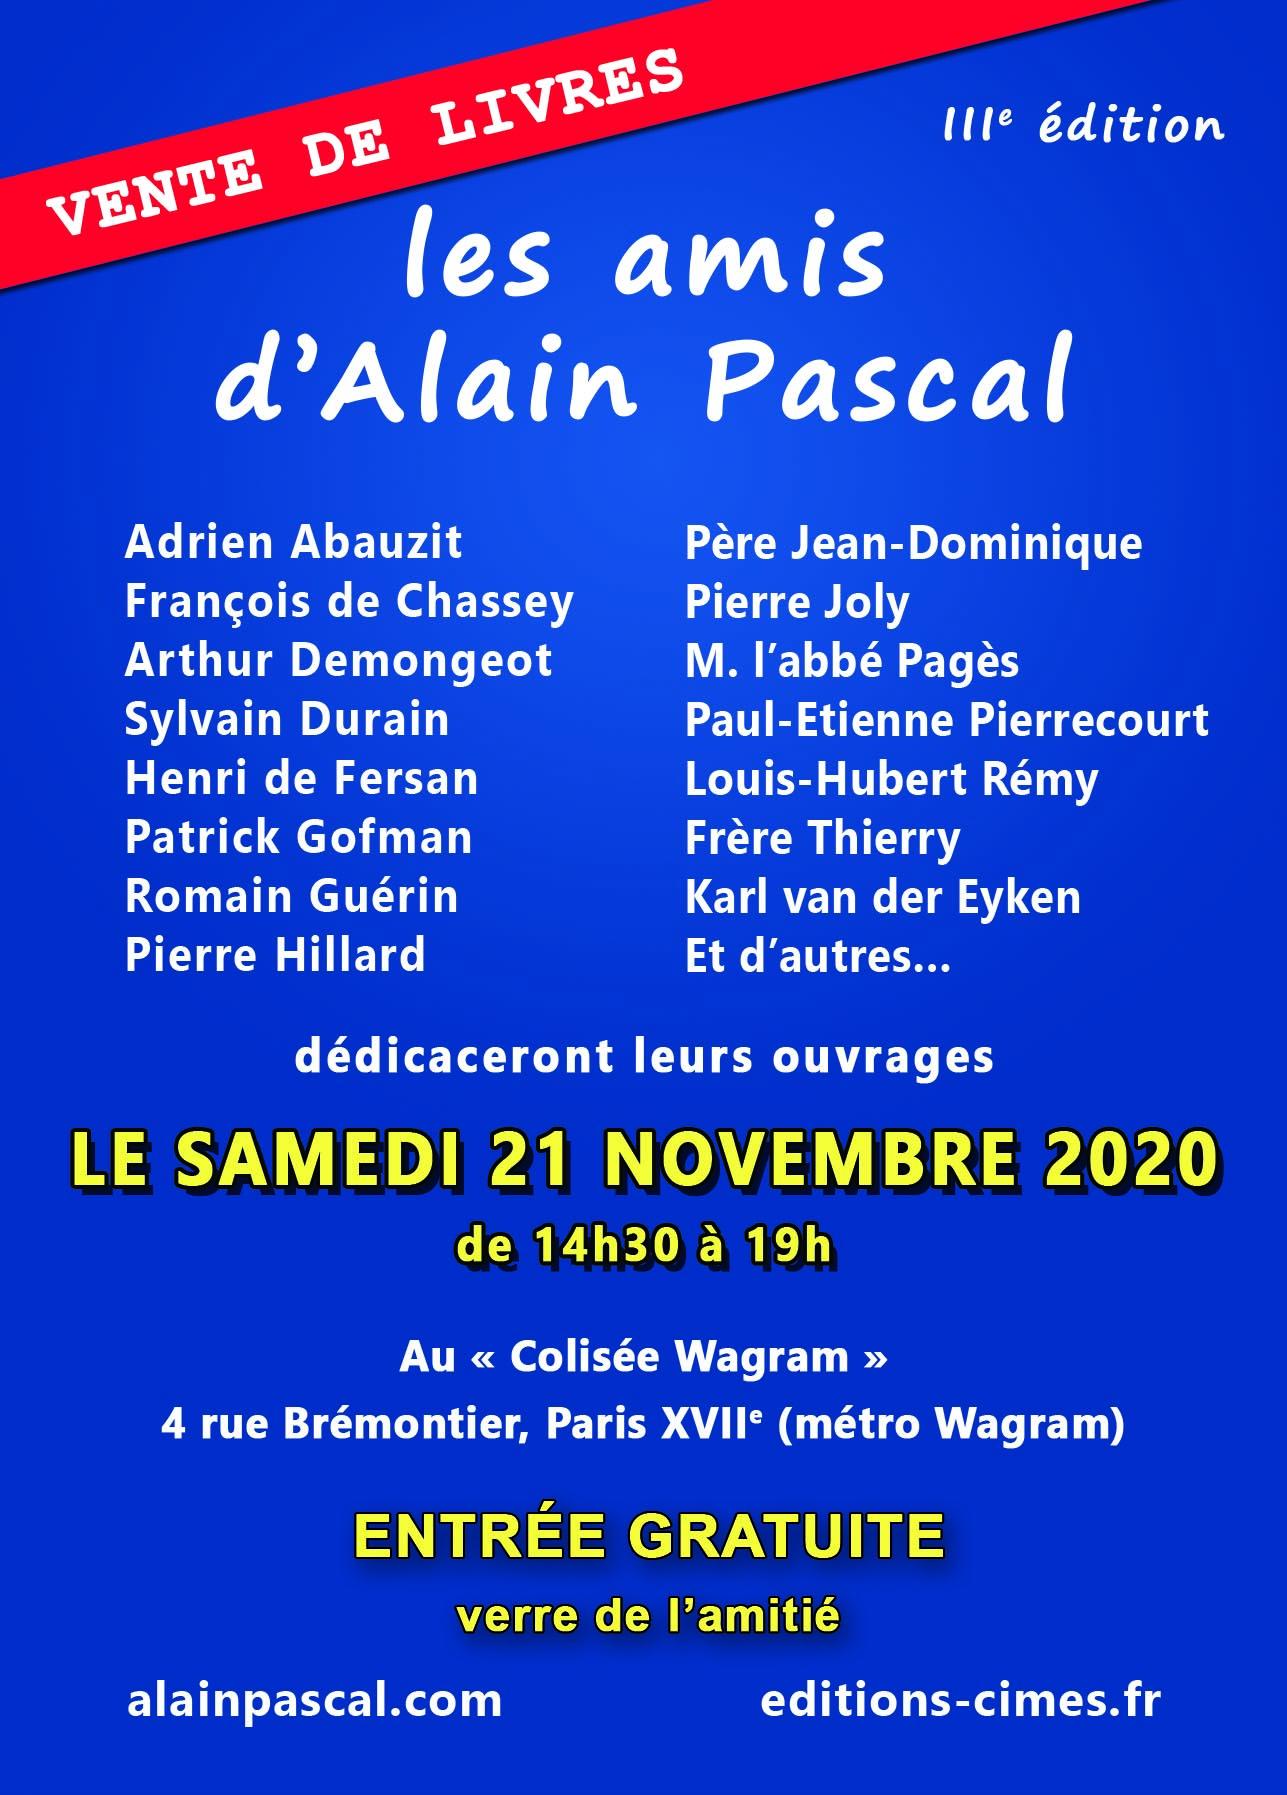 Amis d'Alain Pascal le 21 novembre 2020